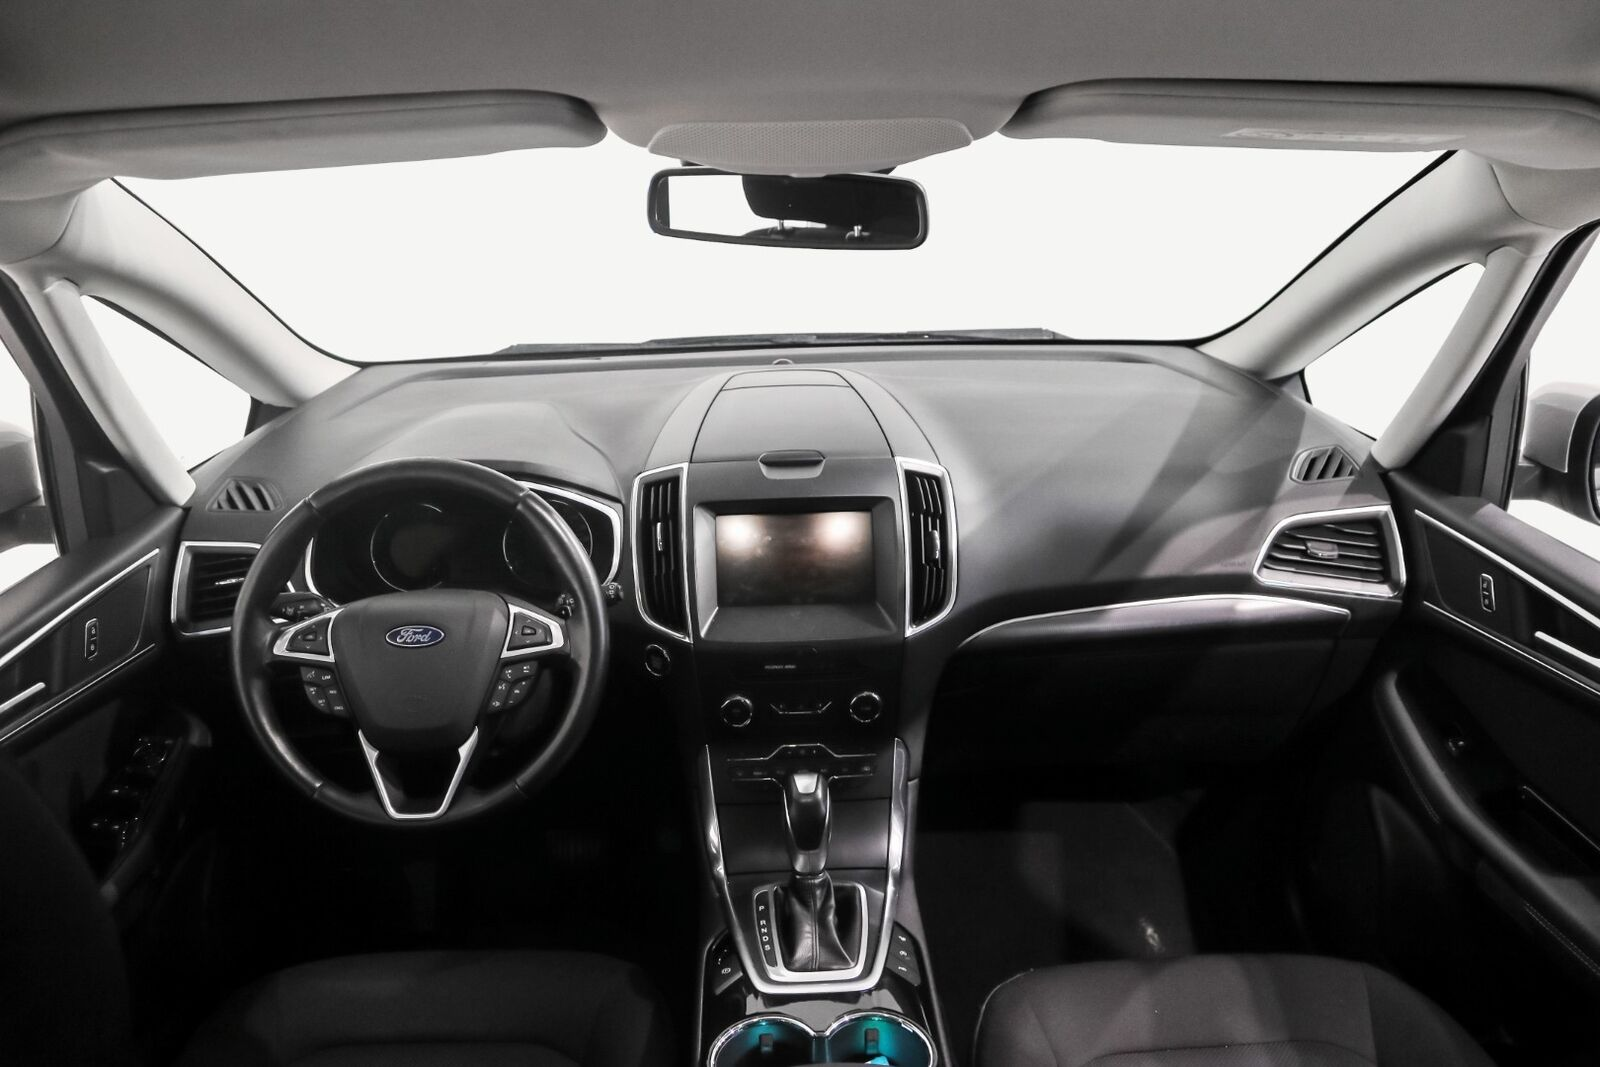 Ford Galaxy 2,0 TDCi 150 Titanium aut. - billede 6